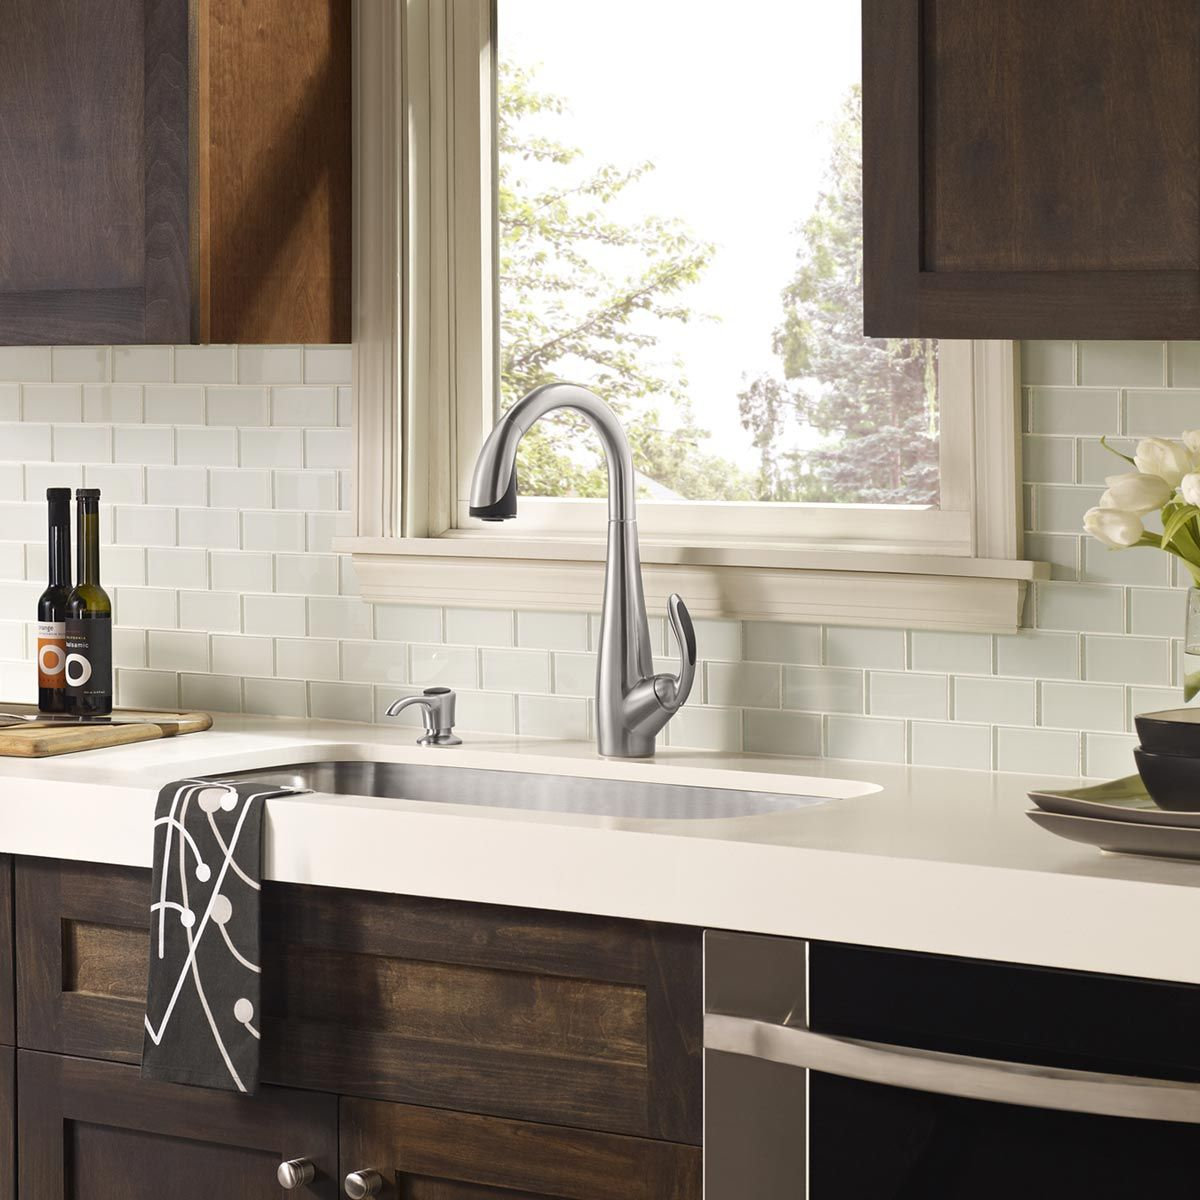 white glass tile backsplash, white countertop with dark